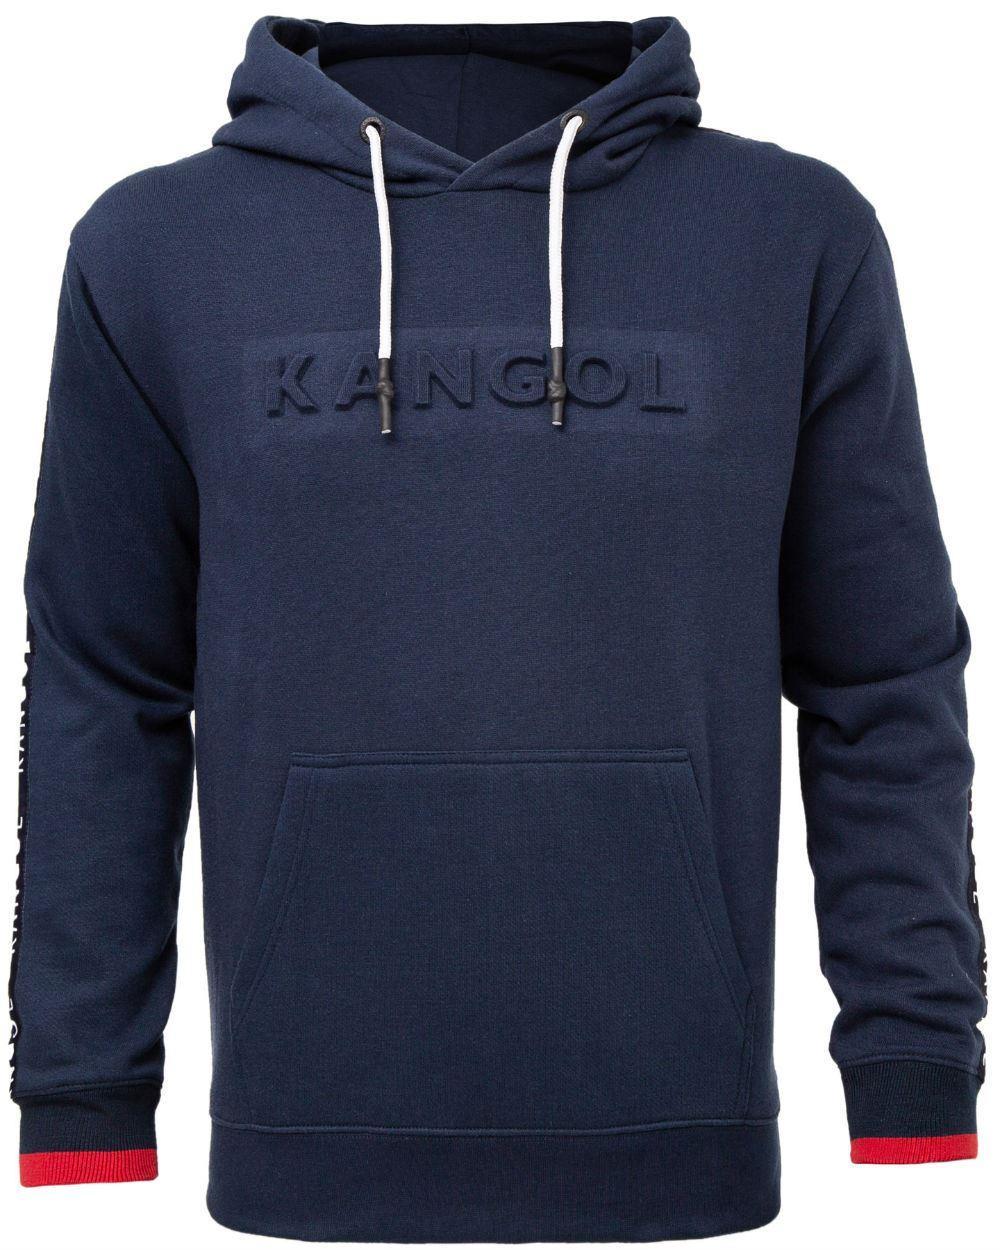 Kangol Troy Overhead Hoody With Embossed Logo - Navy 2XL